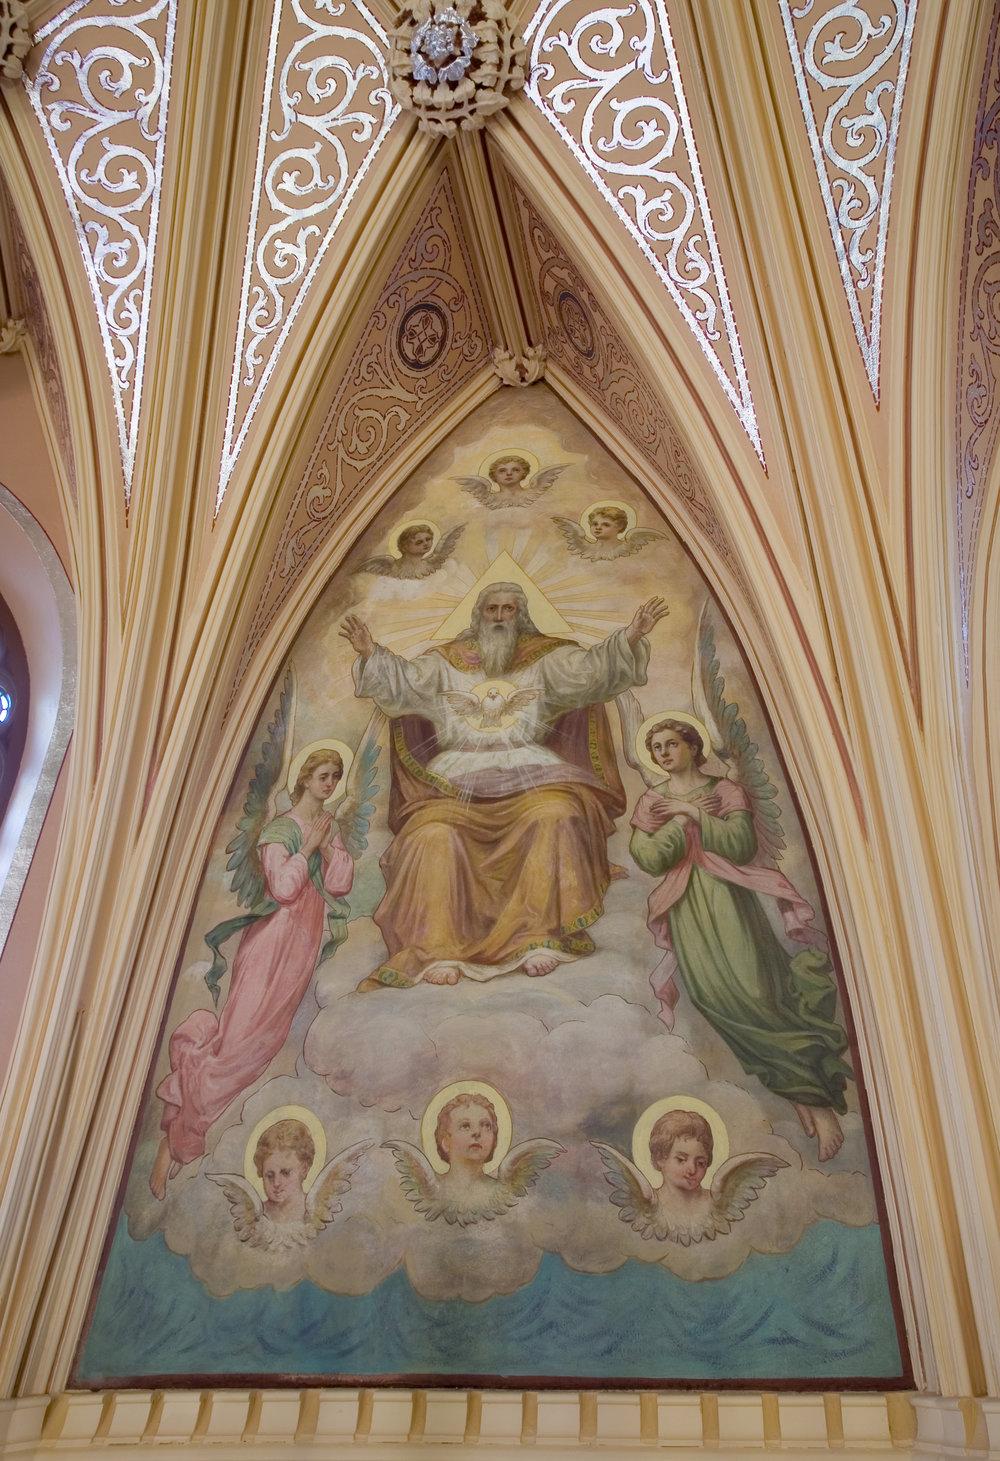 st-anne-upper-wall-mural2.jpg